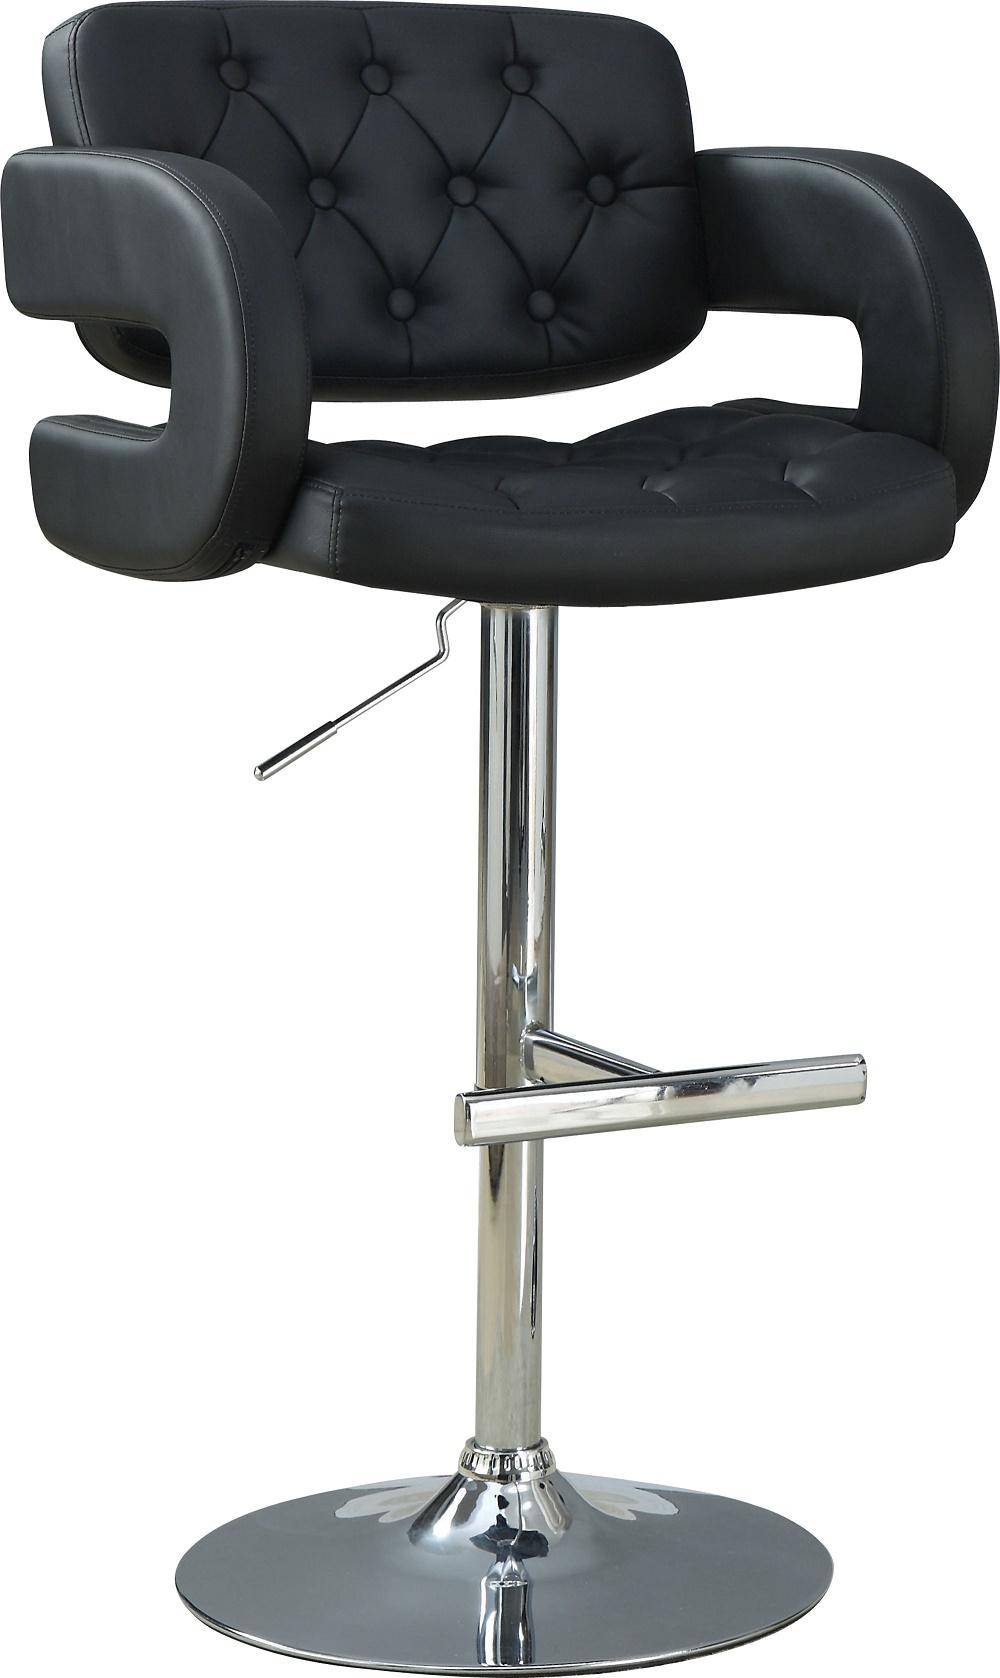 Coaster Black Bar Stool Arm Chair Swivel Adjustable Height